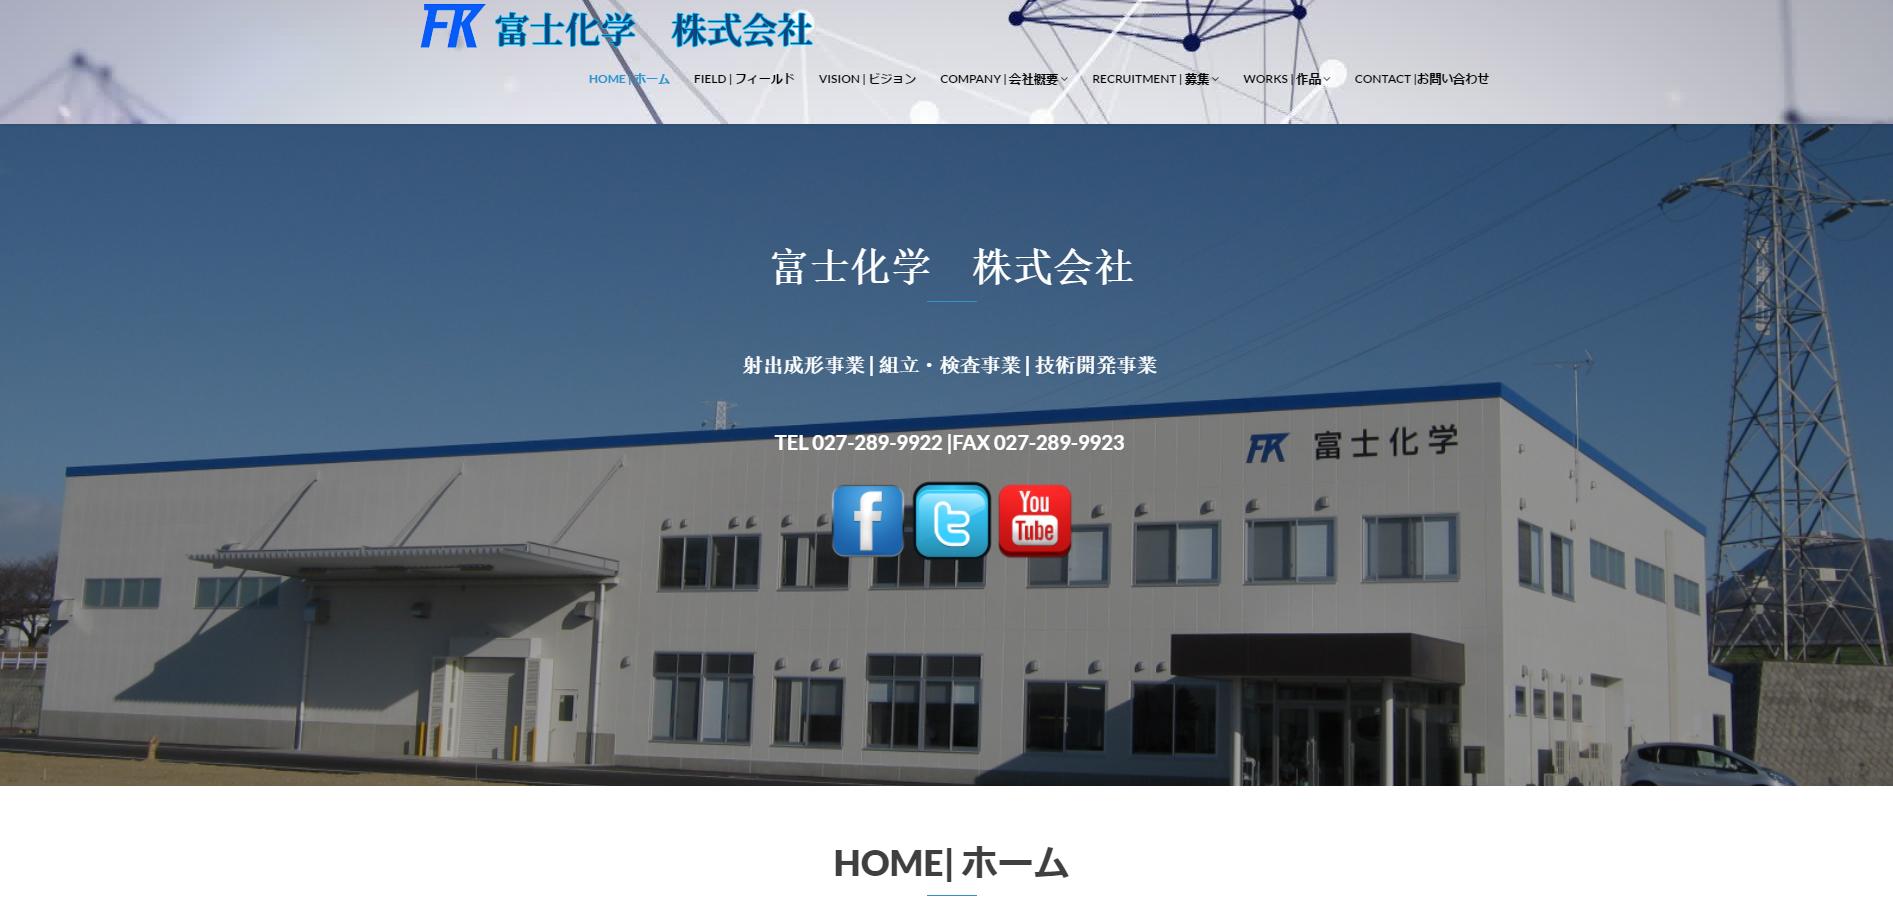 www.fujikagakukk.com   Plastic manufacturer company   Japan   2017